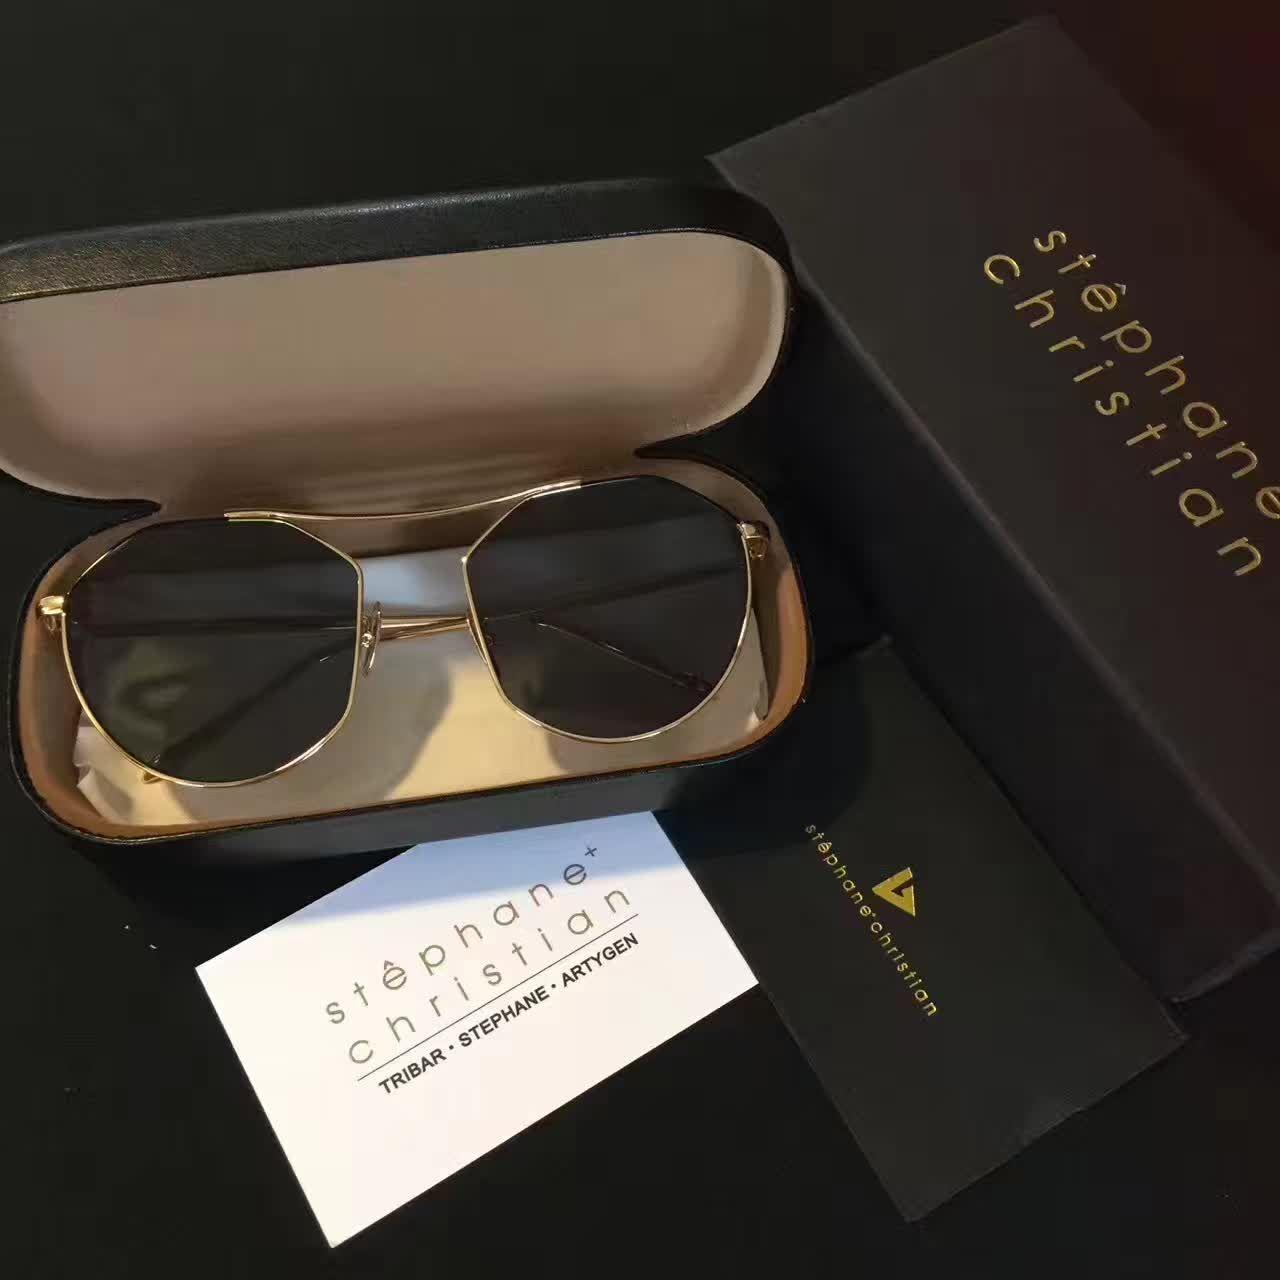 1830766b01d4 Stephane Christian Sunglasses DAYDREAM GDSV BK Gong Hyo Jin Fashion  Designer Brand Sunglasses New With Case Eyewear Designer Sunglasses From  Yogaw